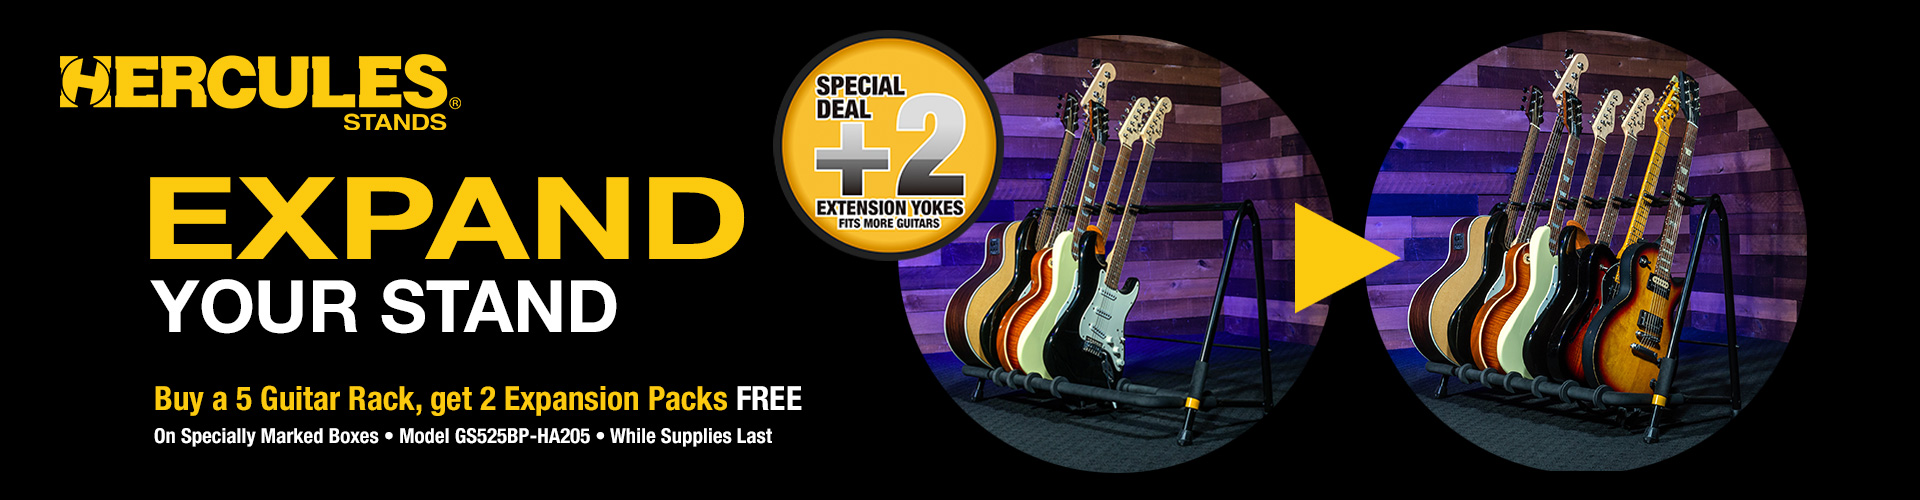 Guitar Rack Expansion Promo